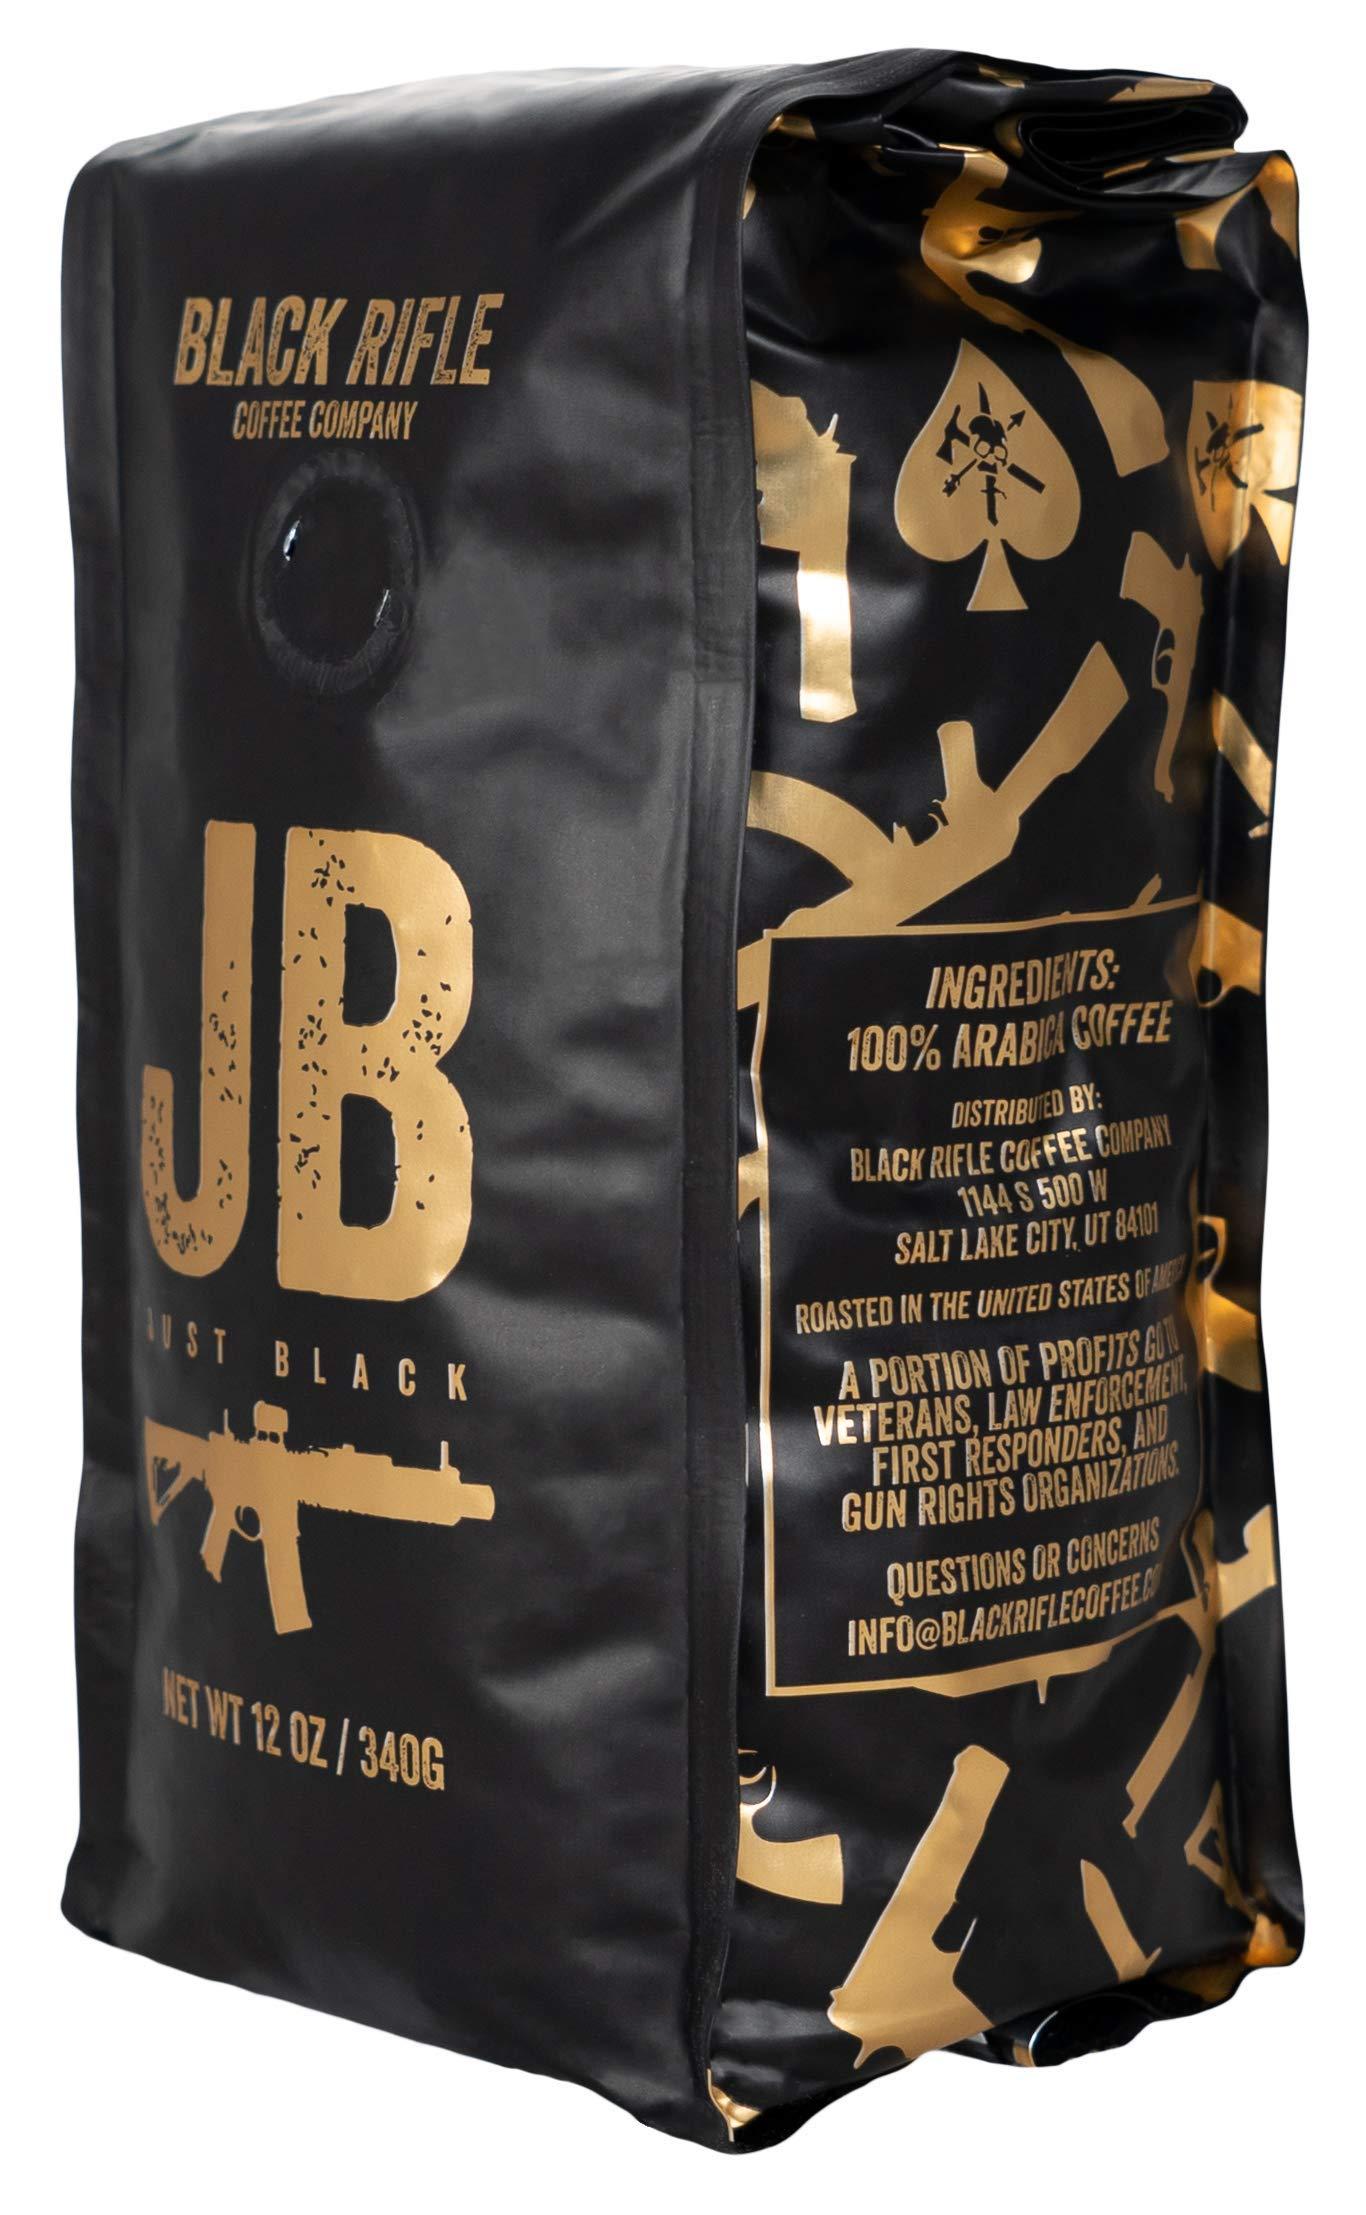 Black Rifle Coffee Company Just Black Coffee, Dark Roast, Whole Bean, 12 Ounce Bag